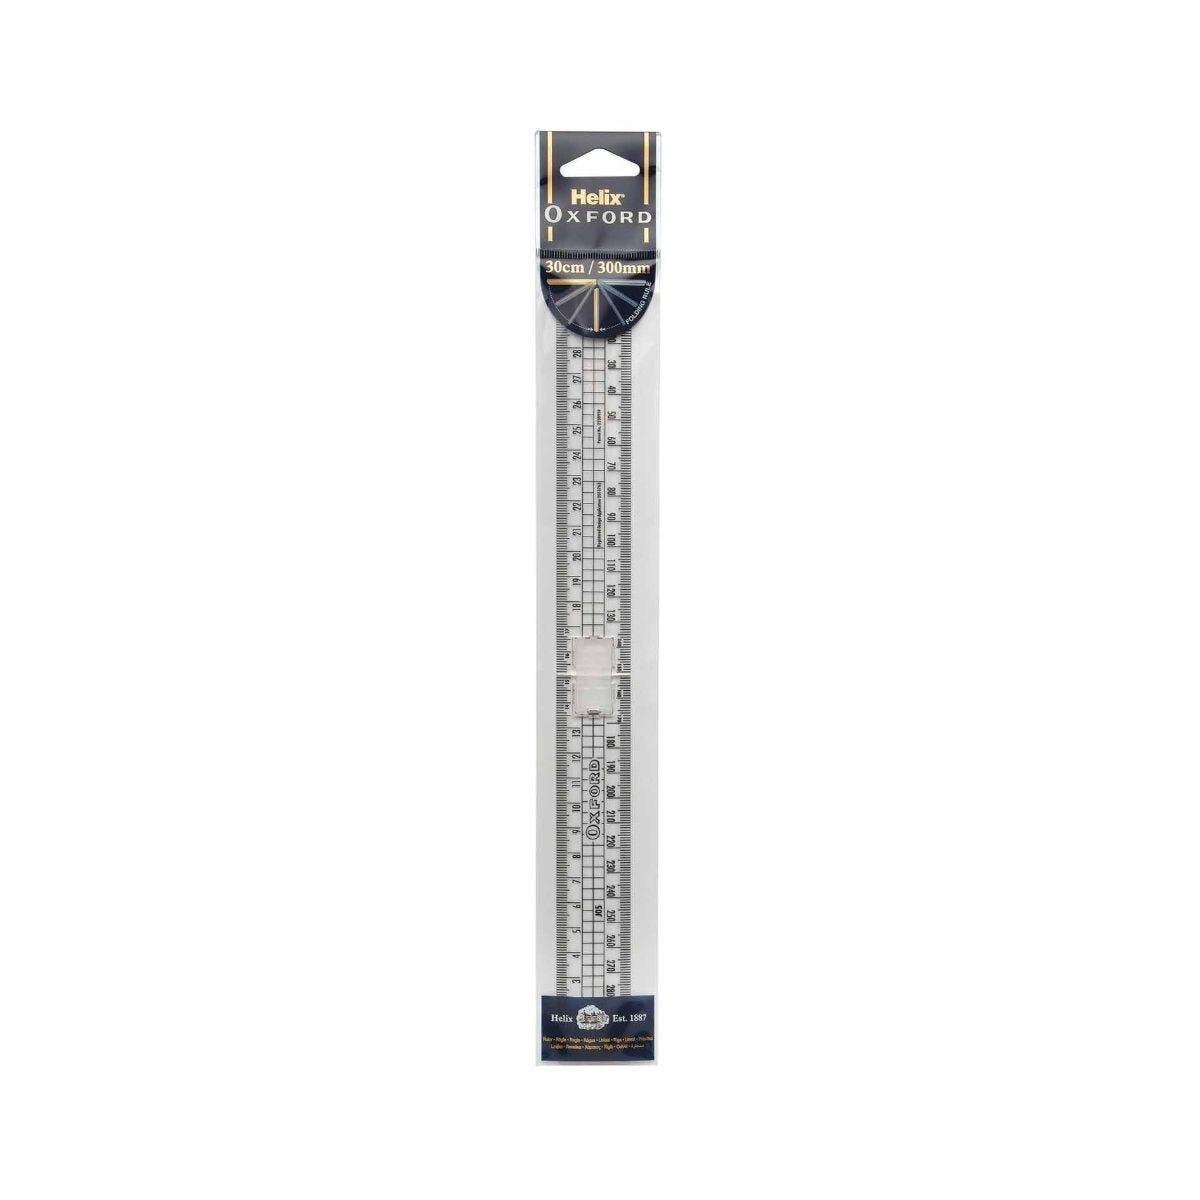 Helix Ruler 30cm Folding